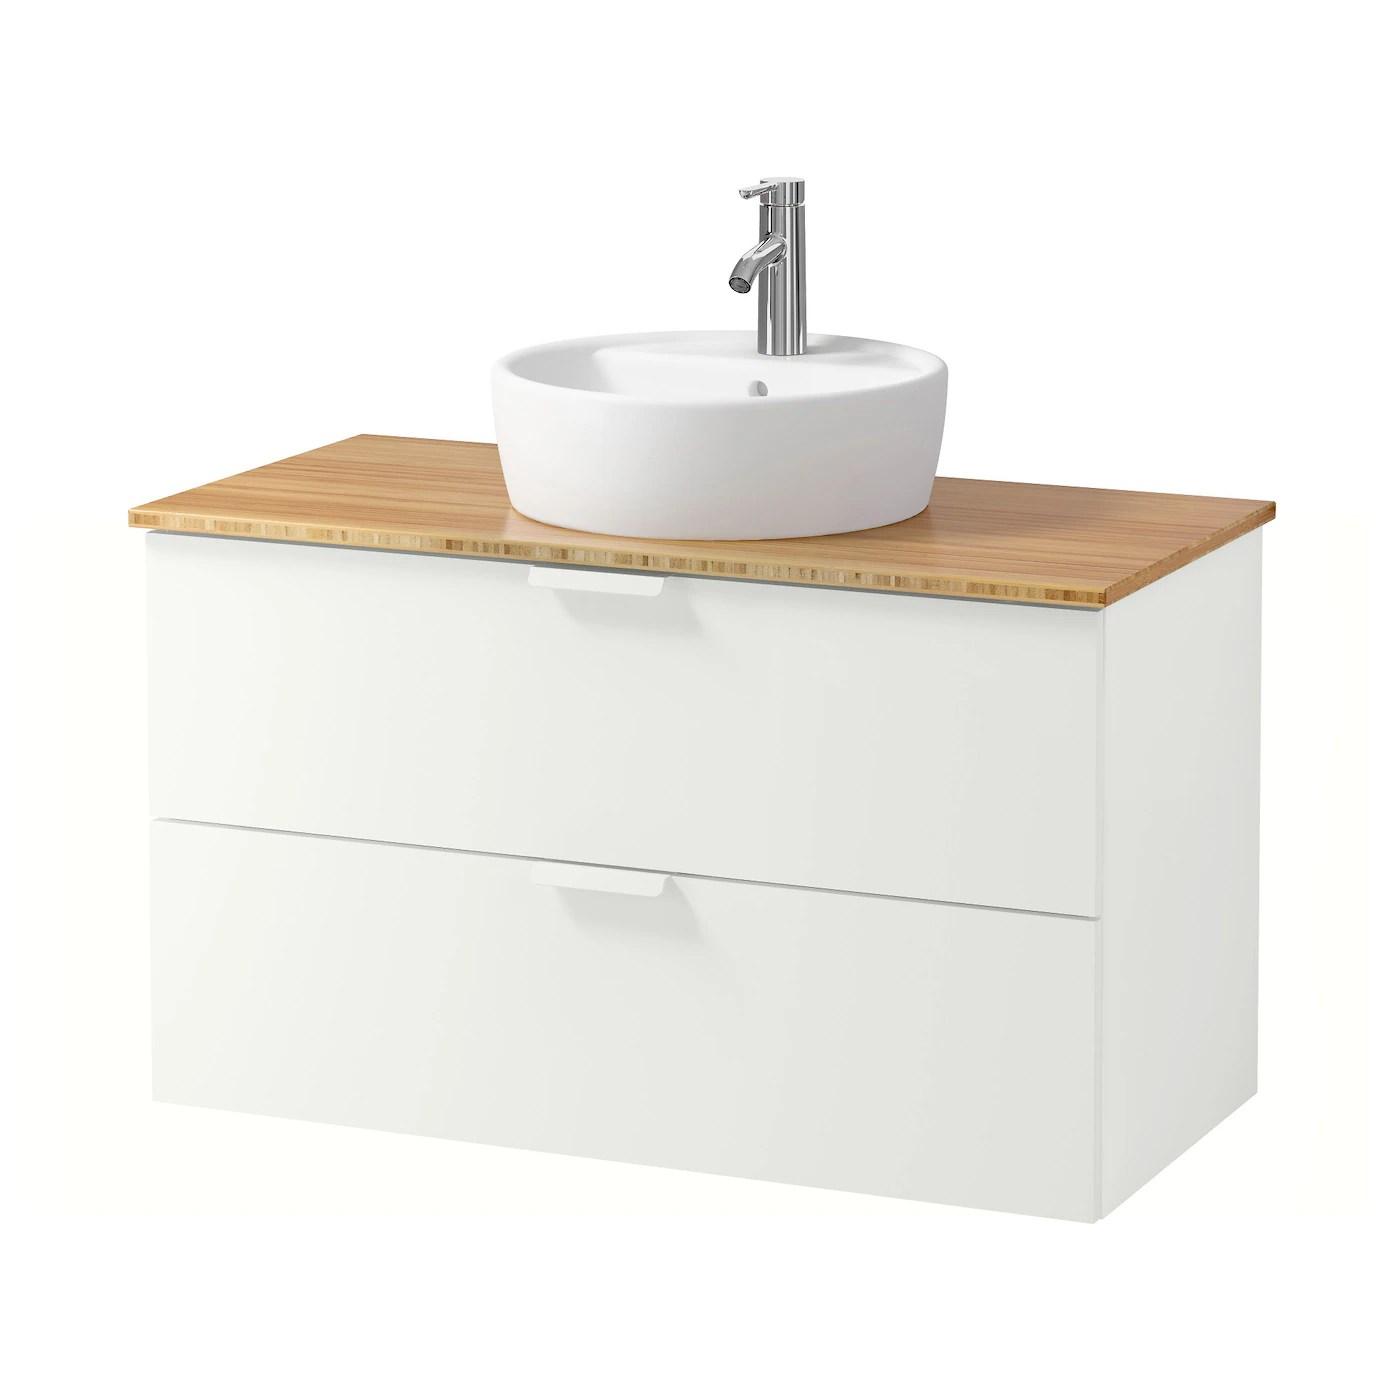 Godmorgon Tolken Tornviken Wsh Stnd W Countertop 45 Wsh Basin White Bamboo Ikea